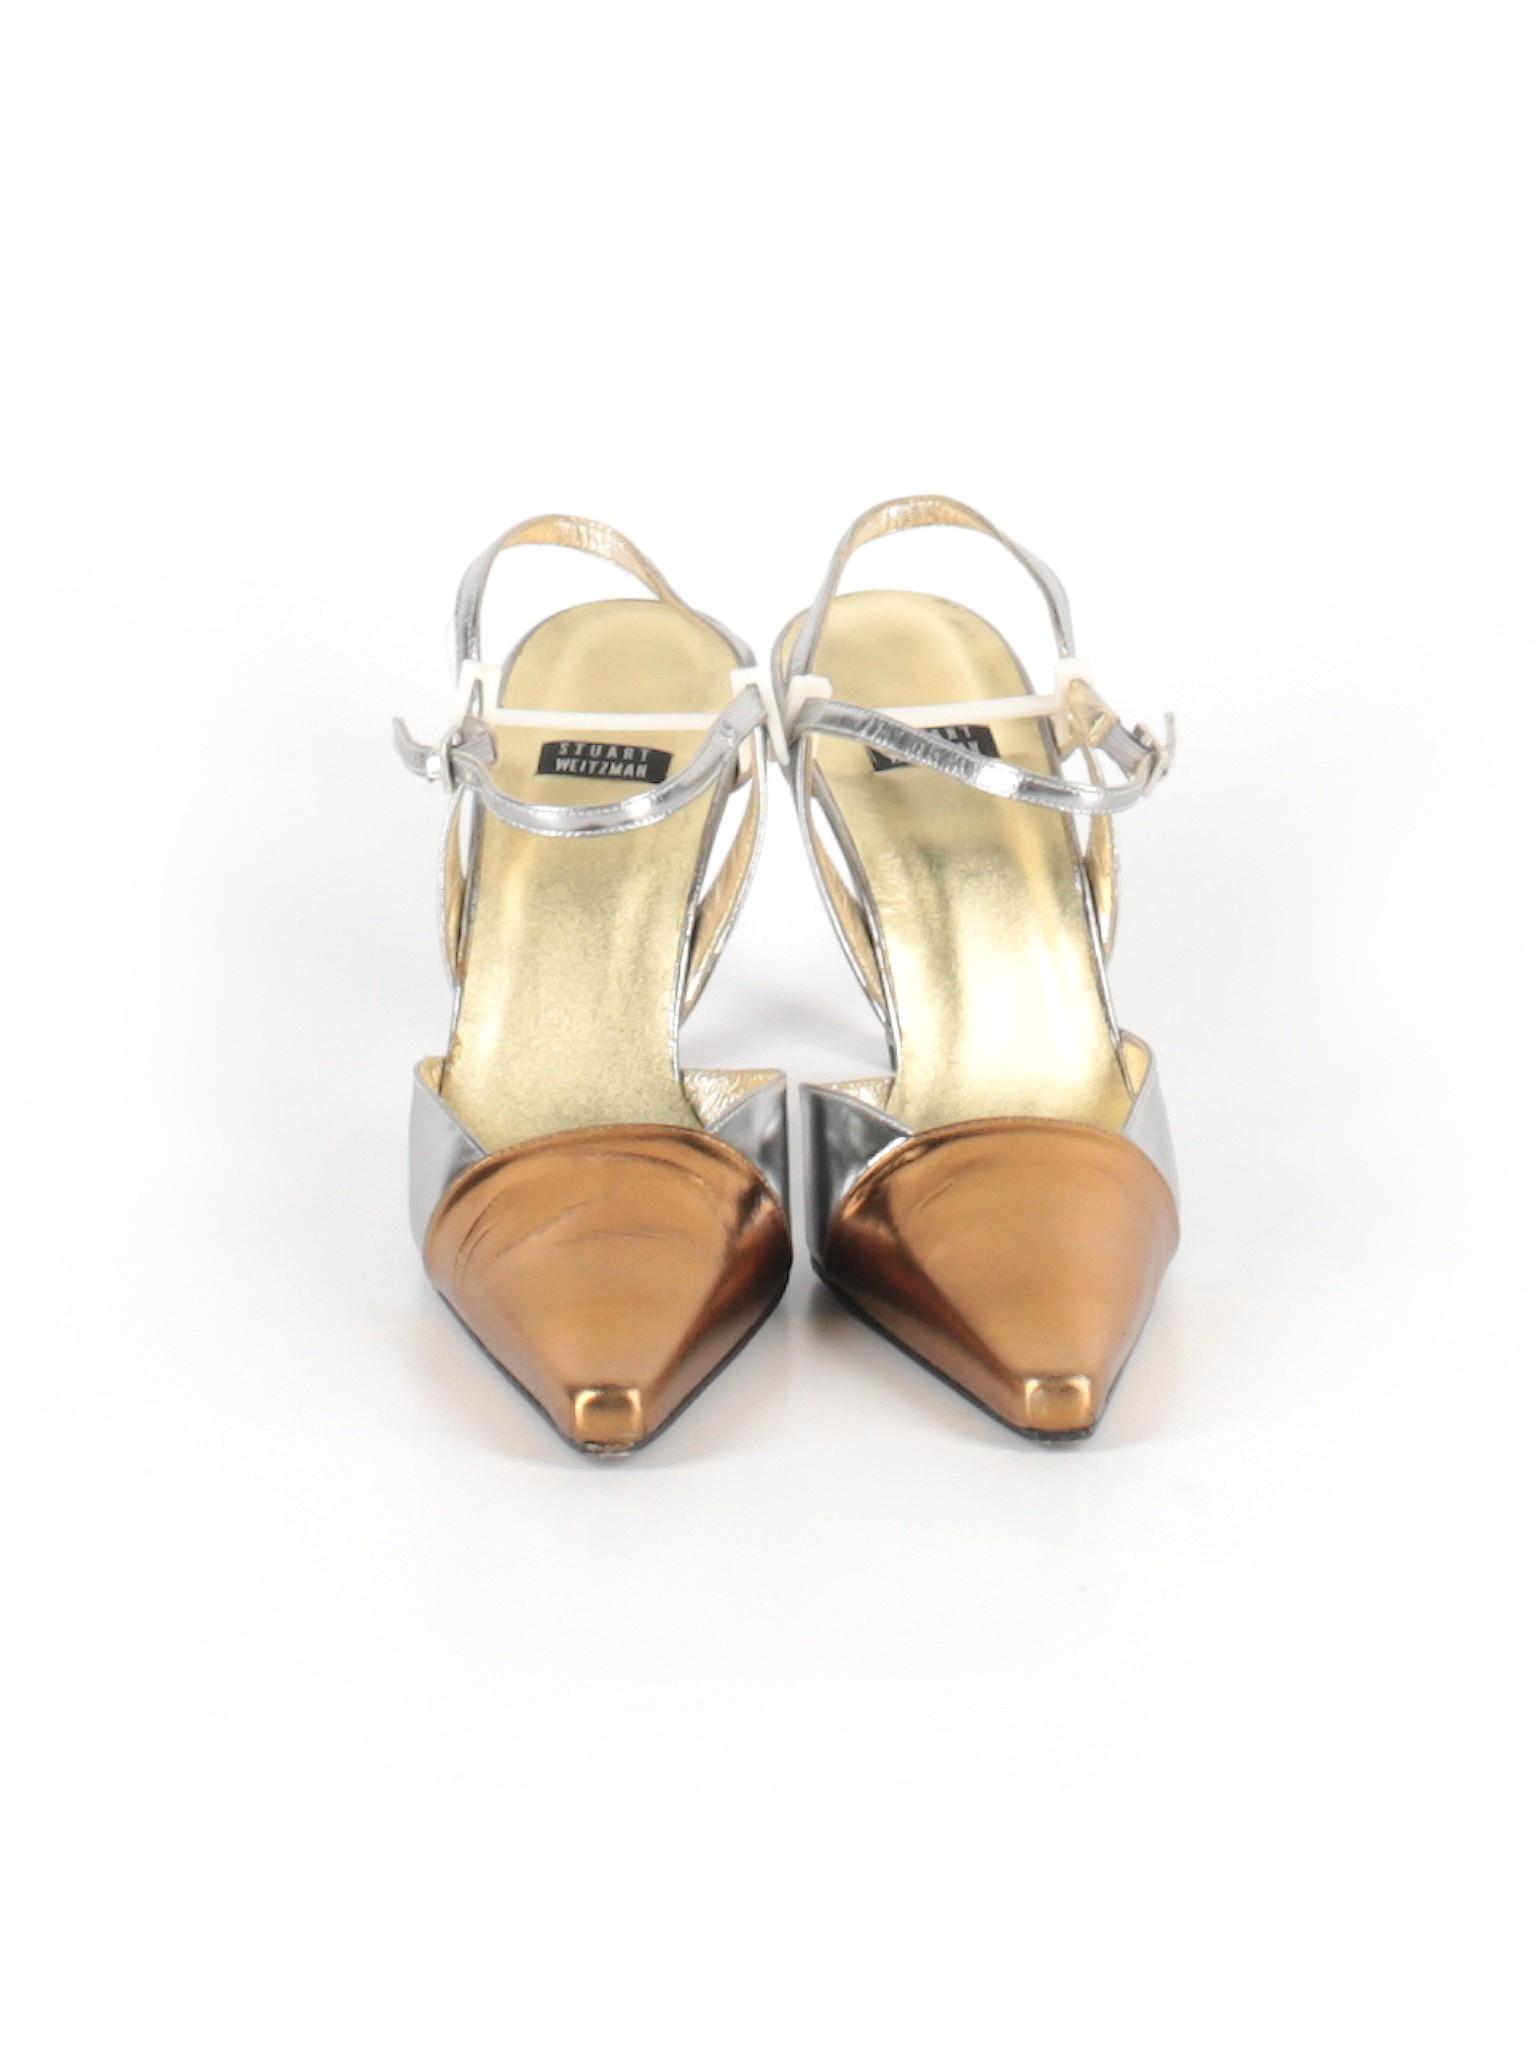 ed9a7acfda5 Stuart Weitzman Metallic Color Block Silver Heels Size 6 - 87% off ...